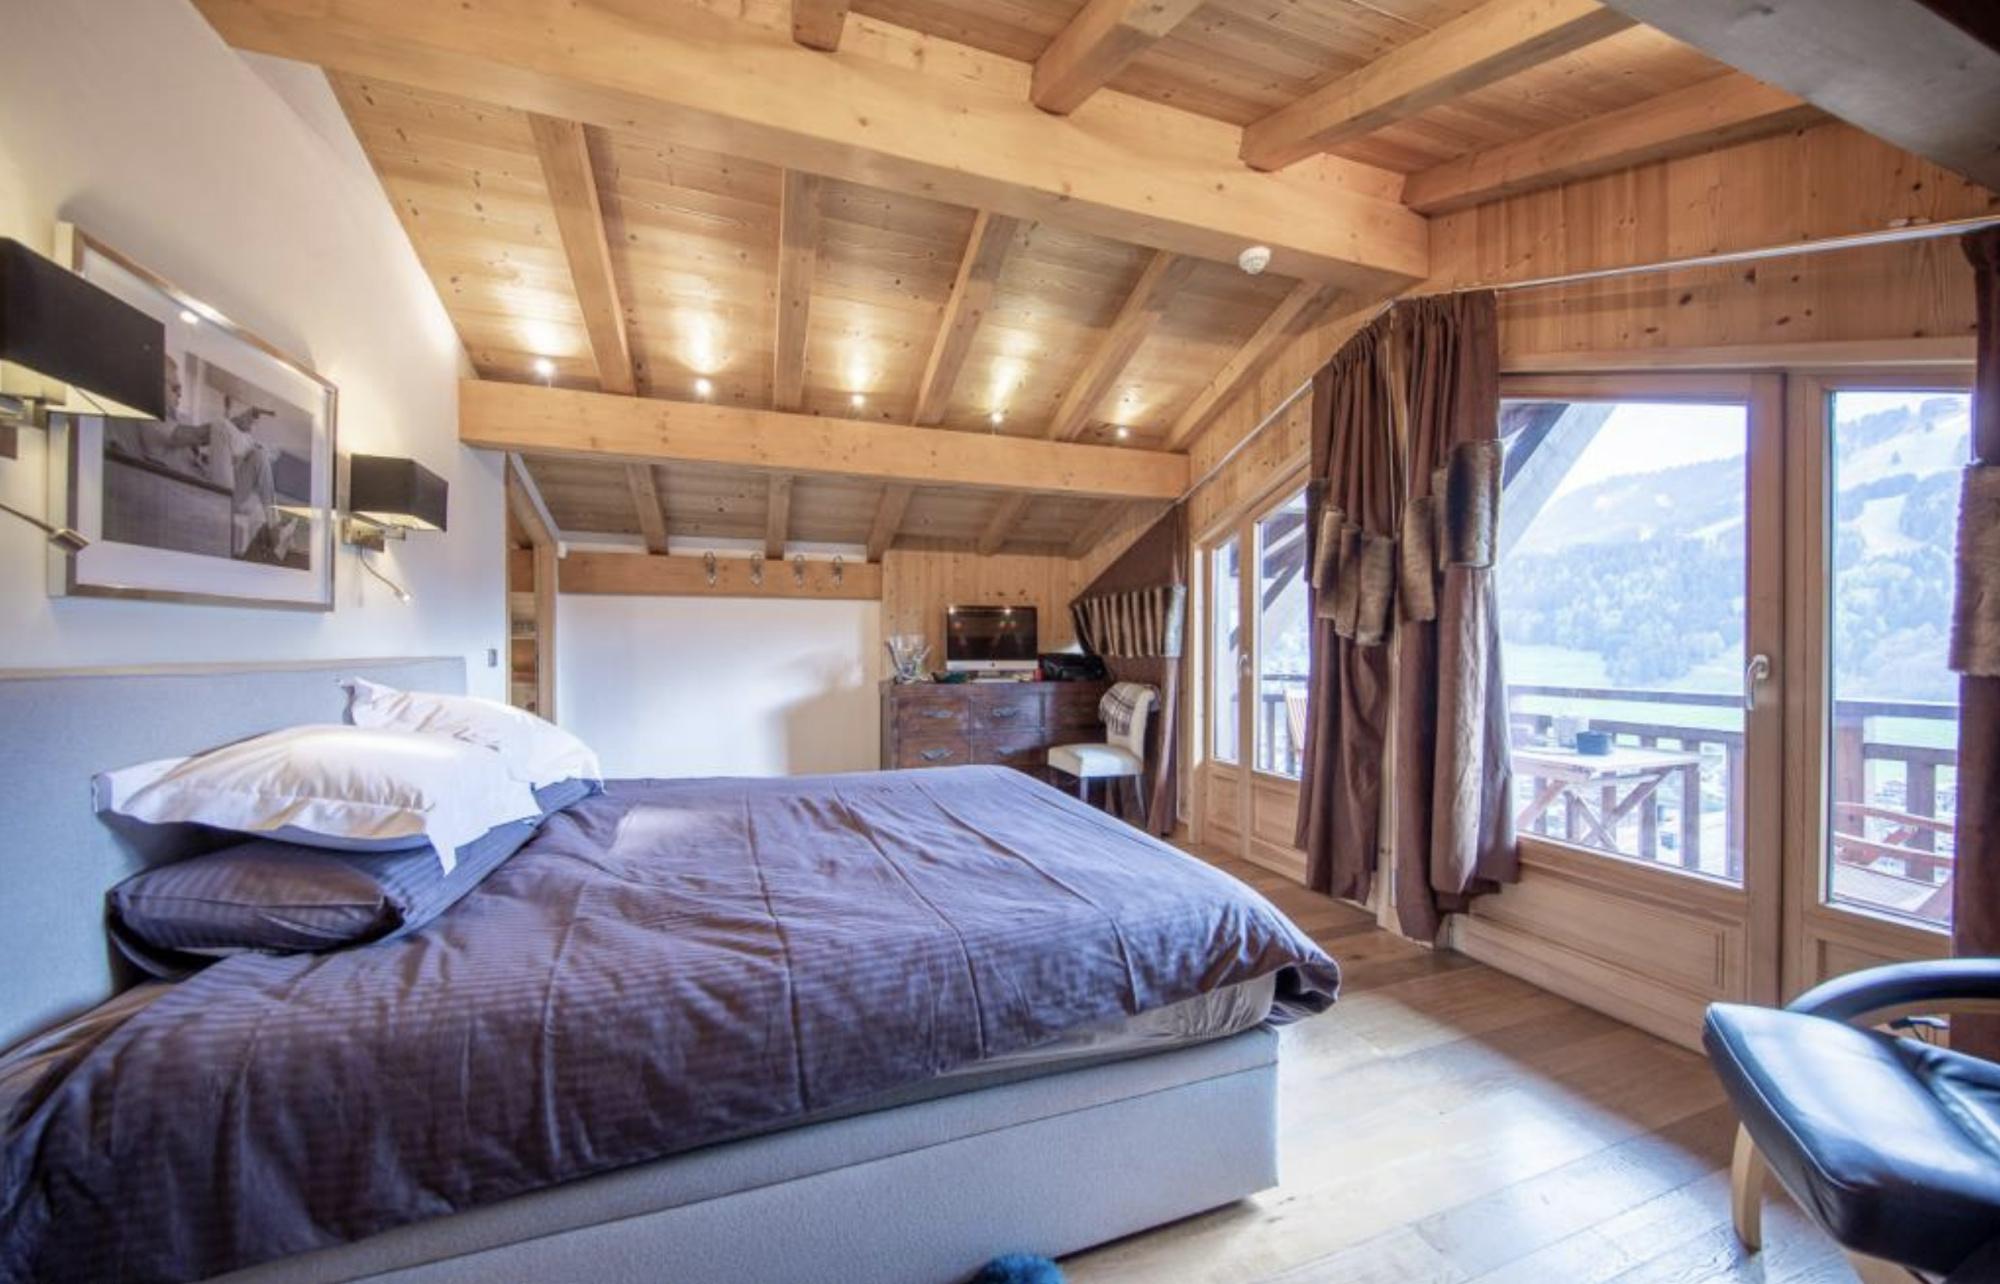 Buy Chalet in Haute Savoie France